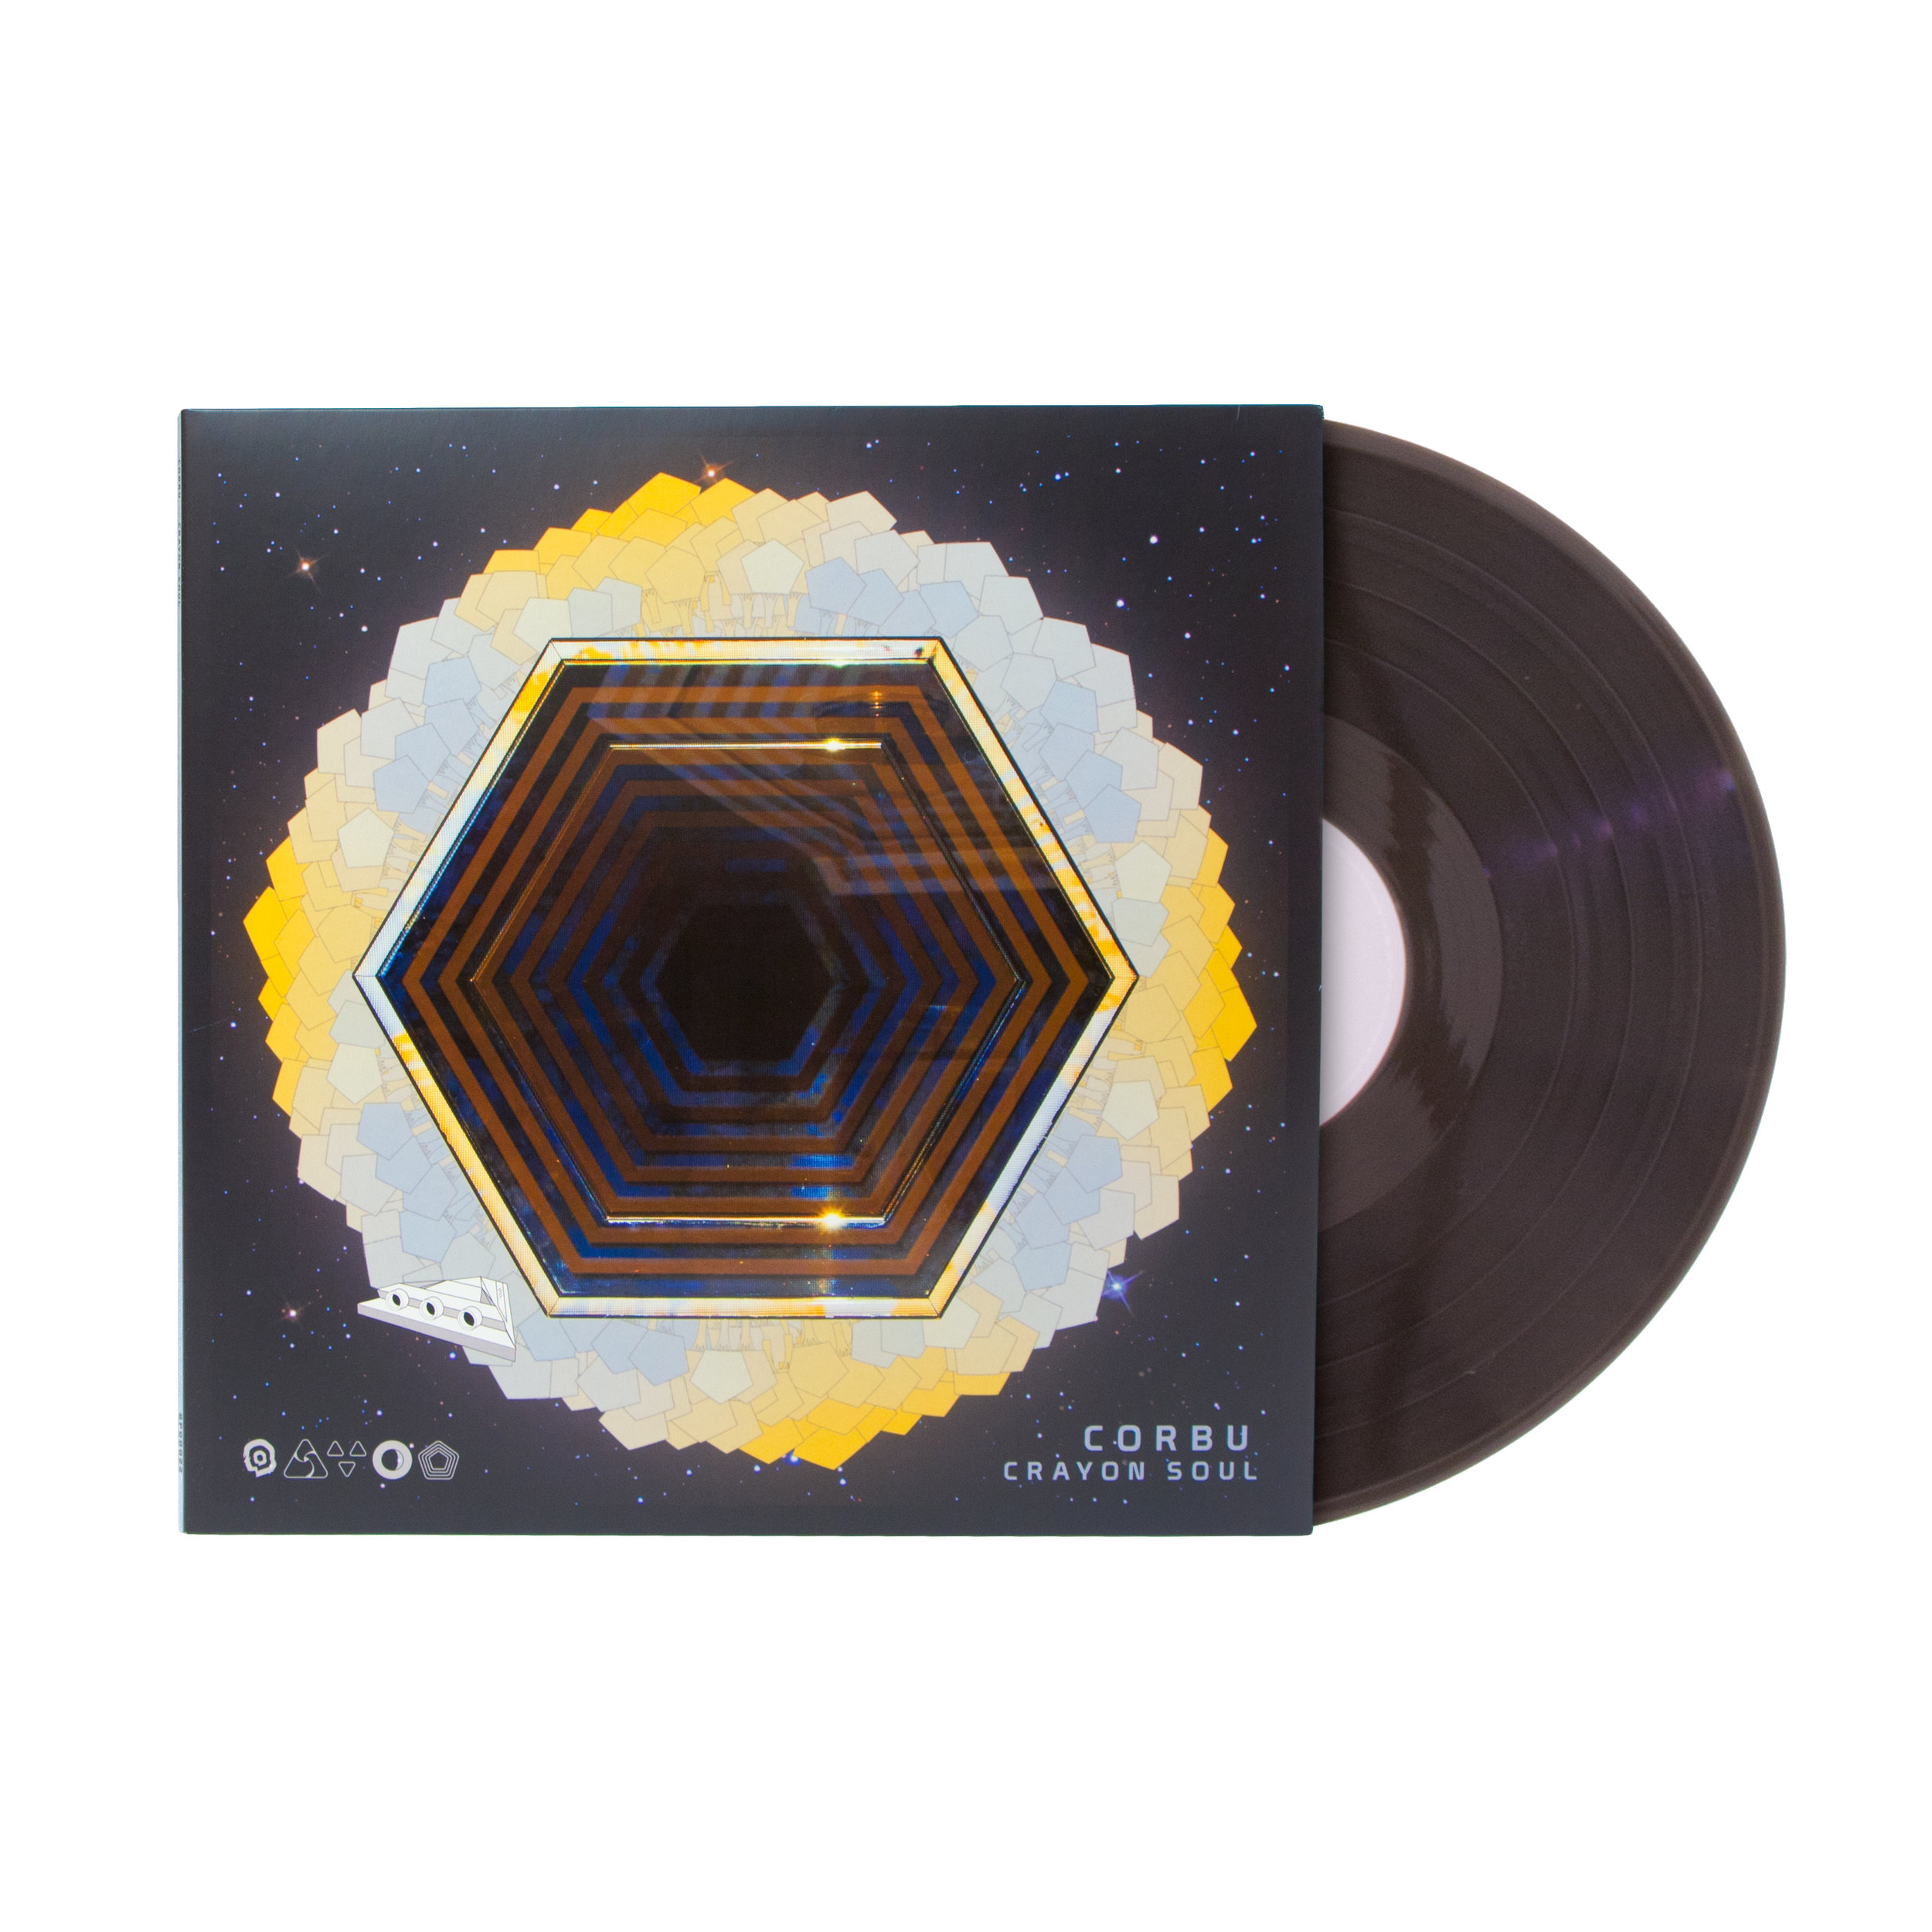 Corbu Crayon Soul Vinyl - Cover with Record.jpg